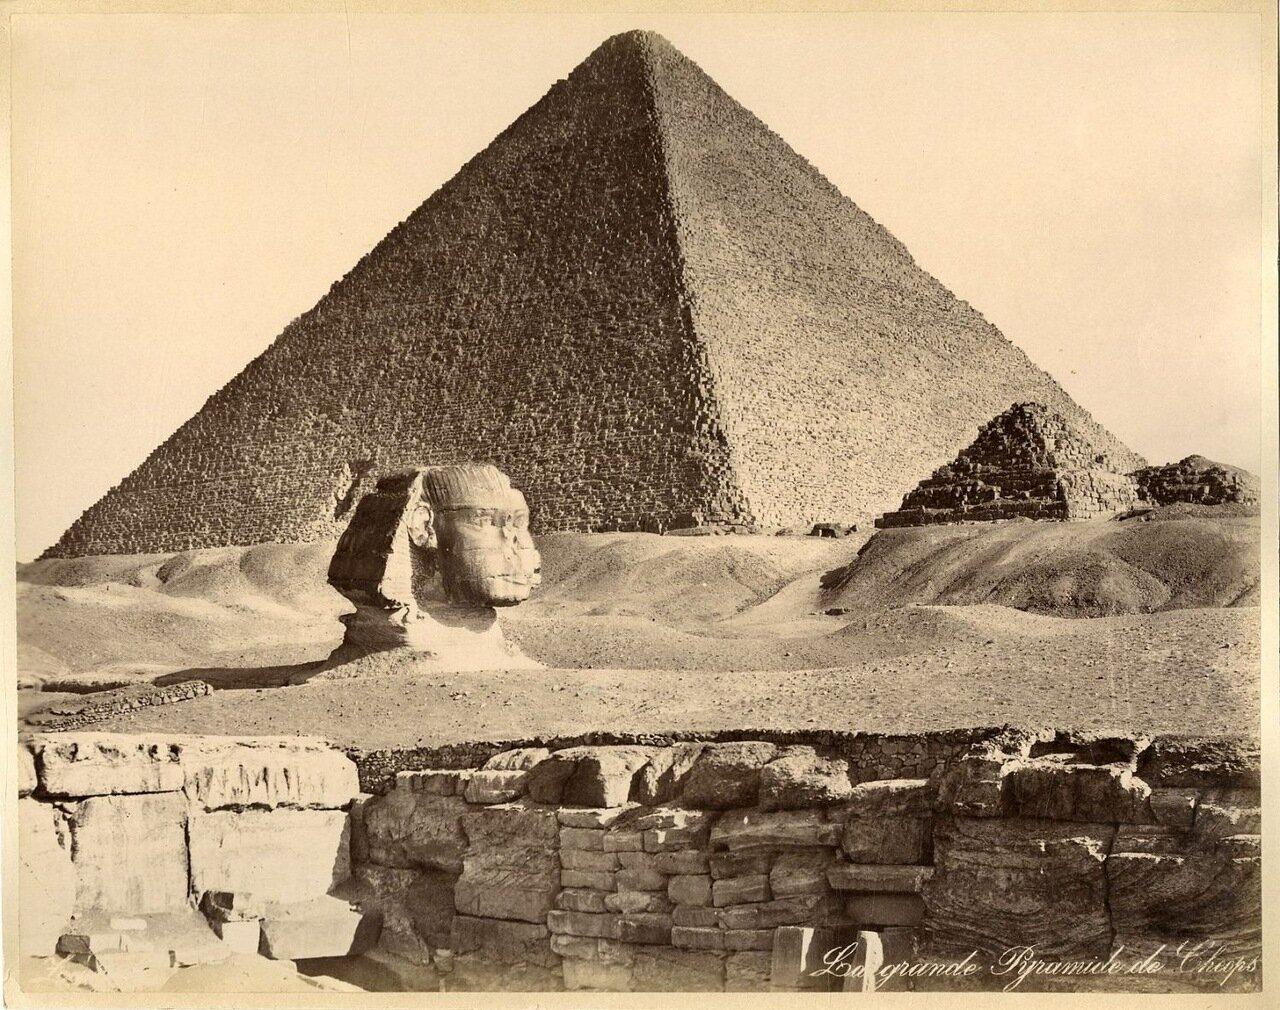 Великая Пирамида Хеопса и Сфинкс